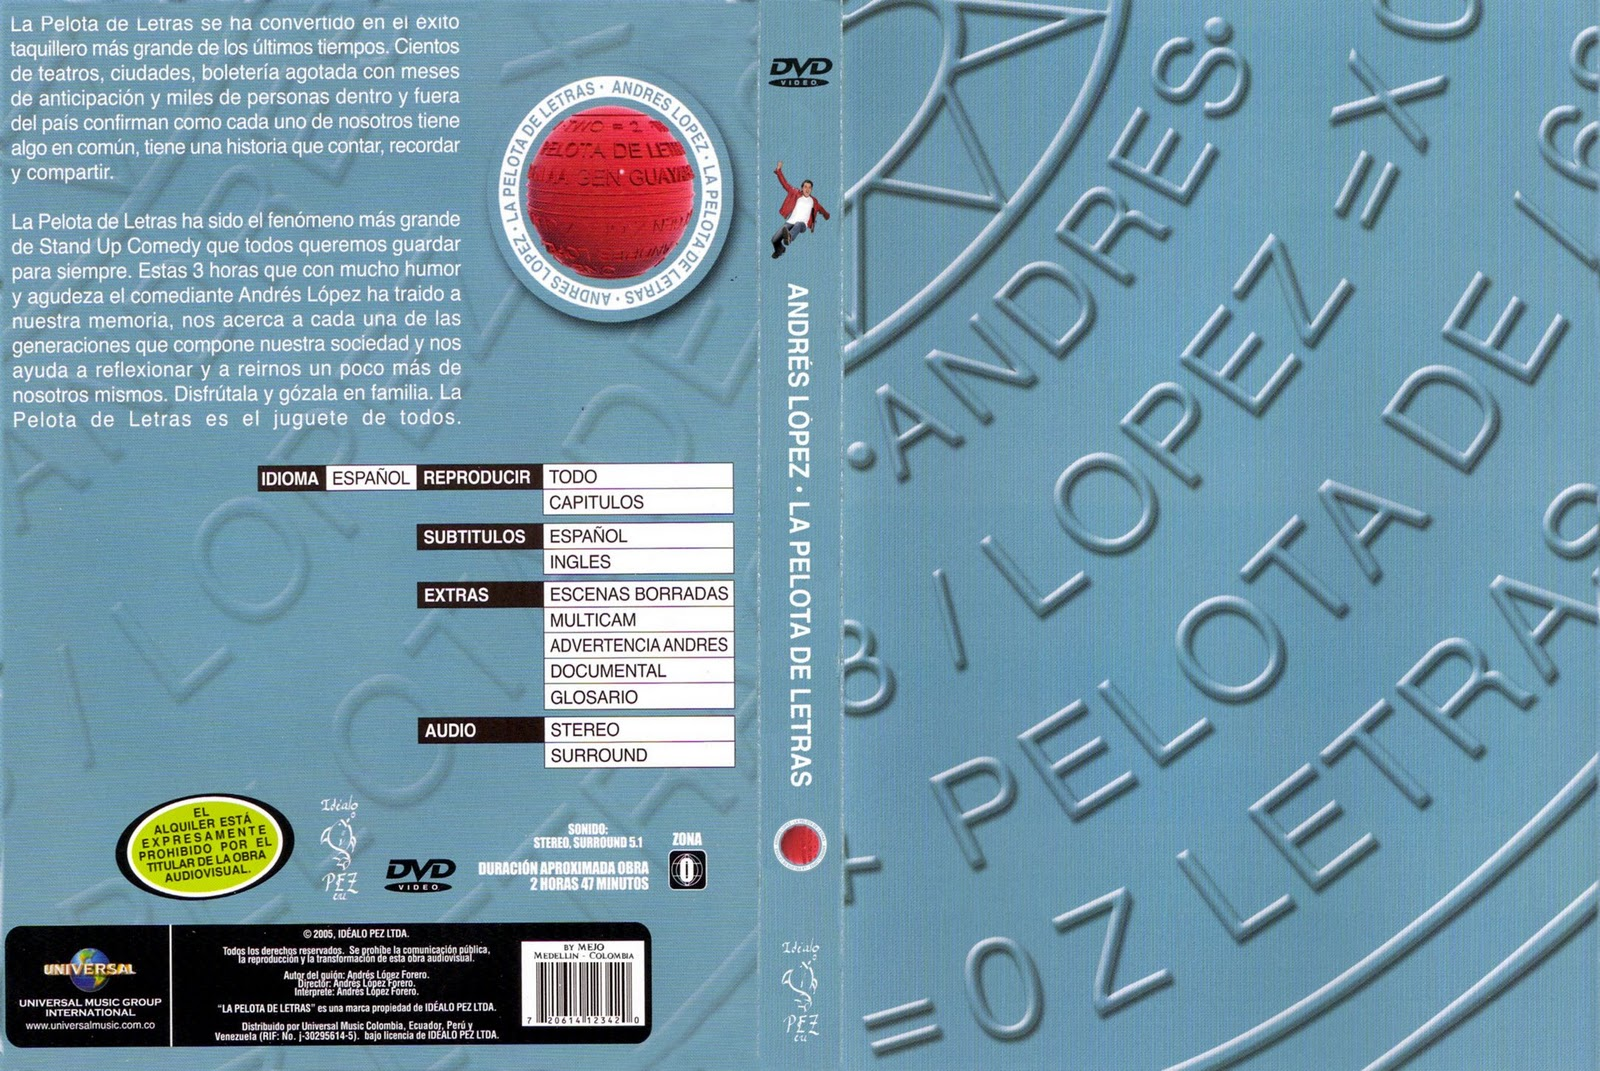 Macromedia Flash Player Mx 2004 Descargar Gratis